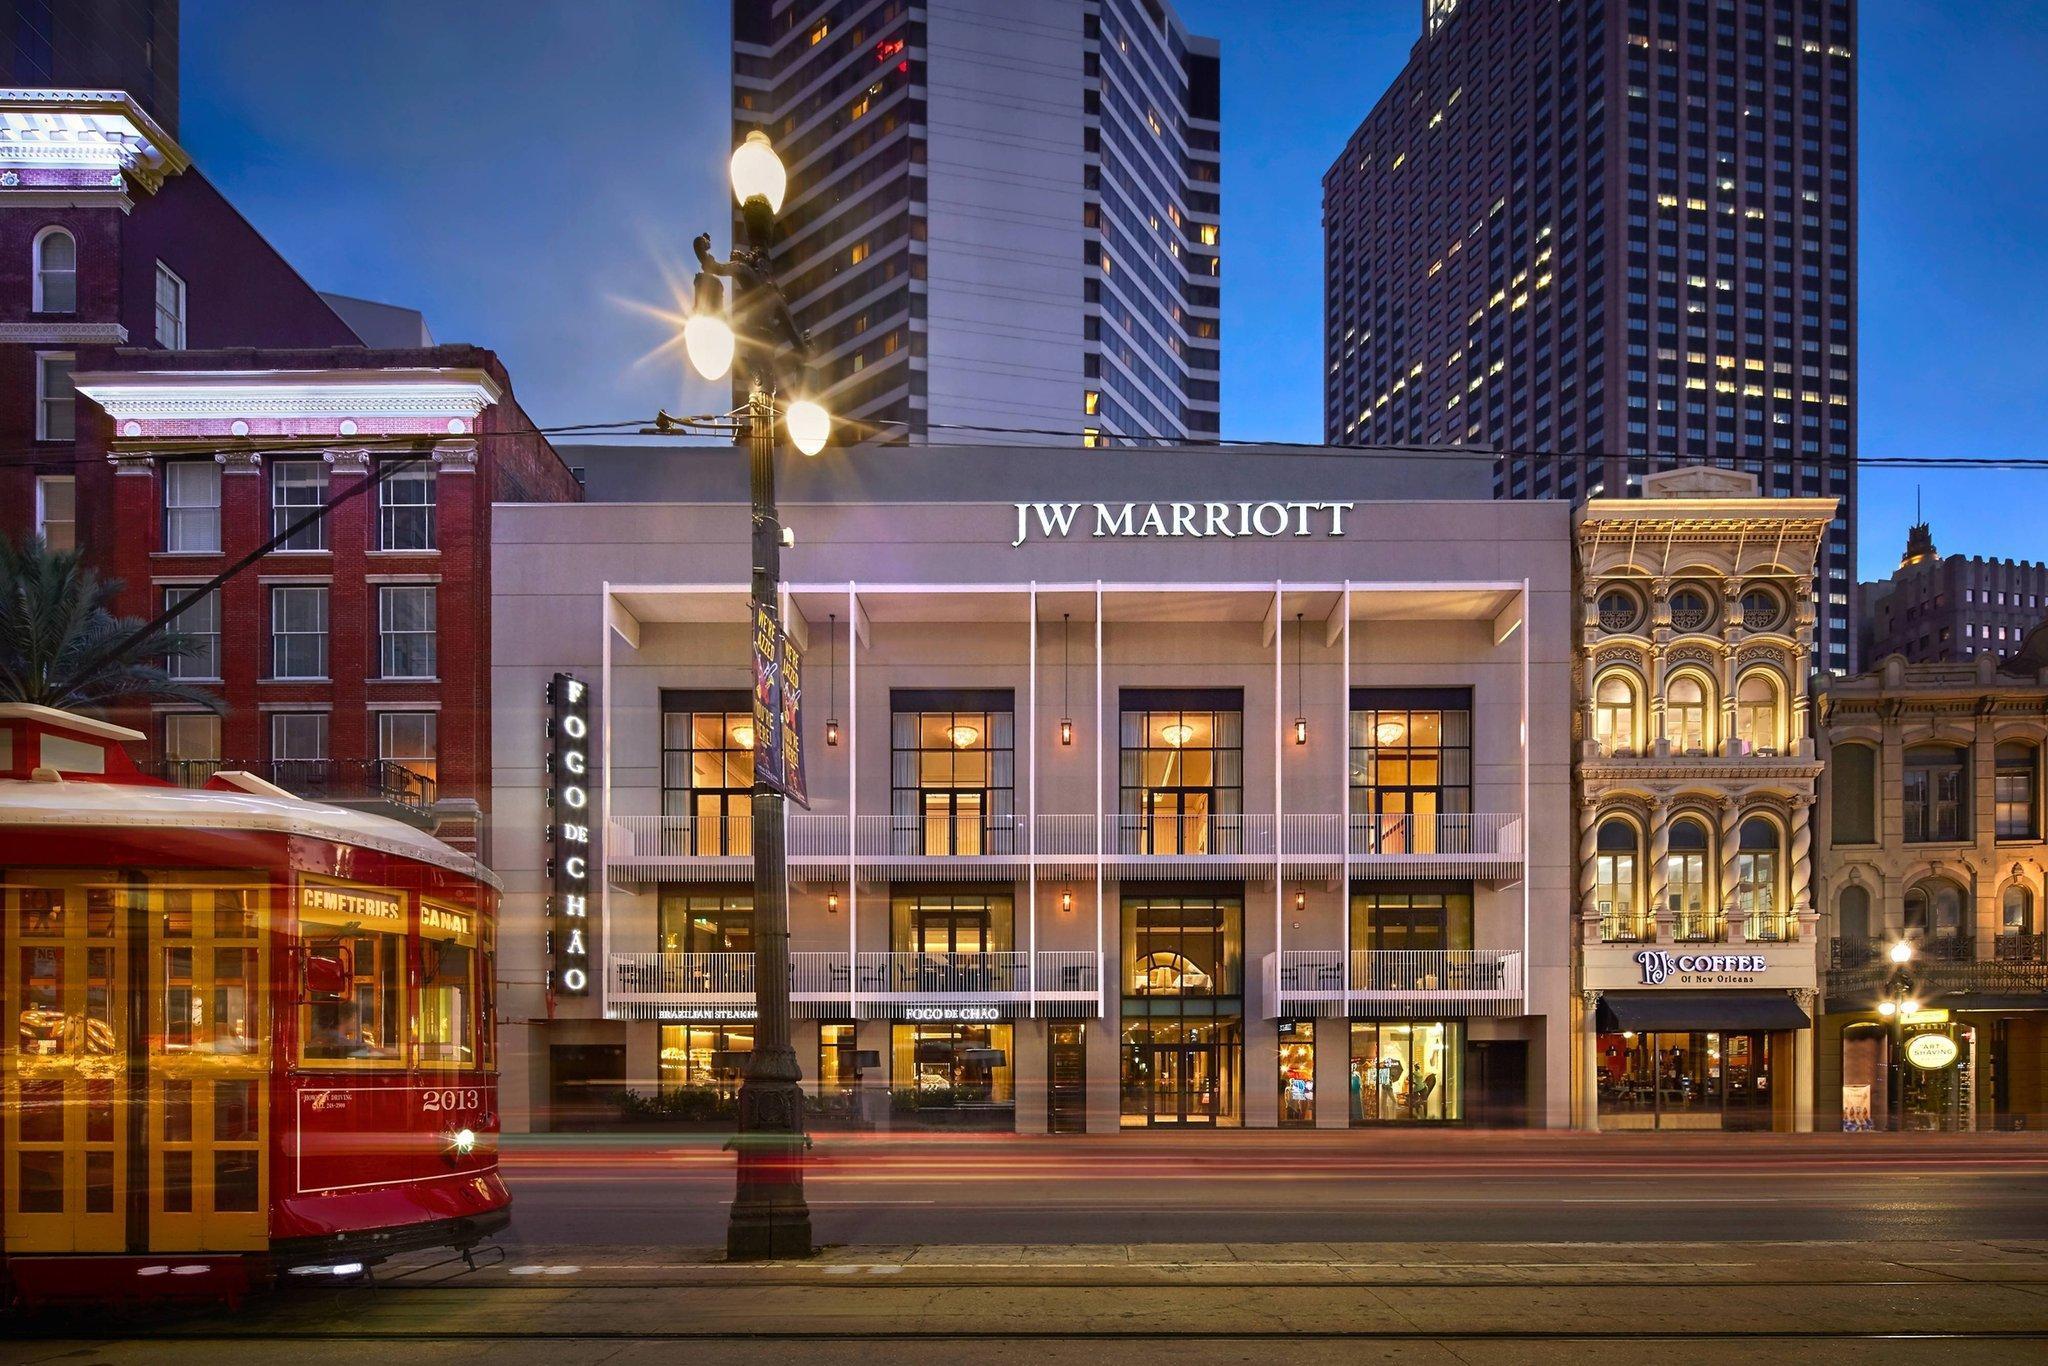 JW Marriott New Orleans